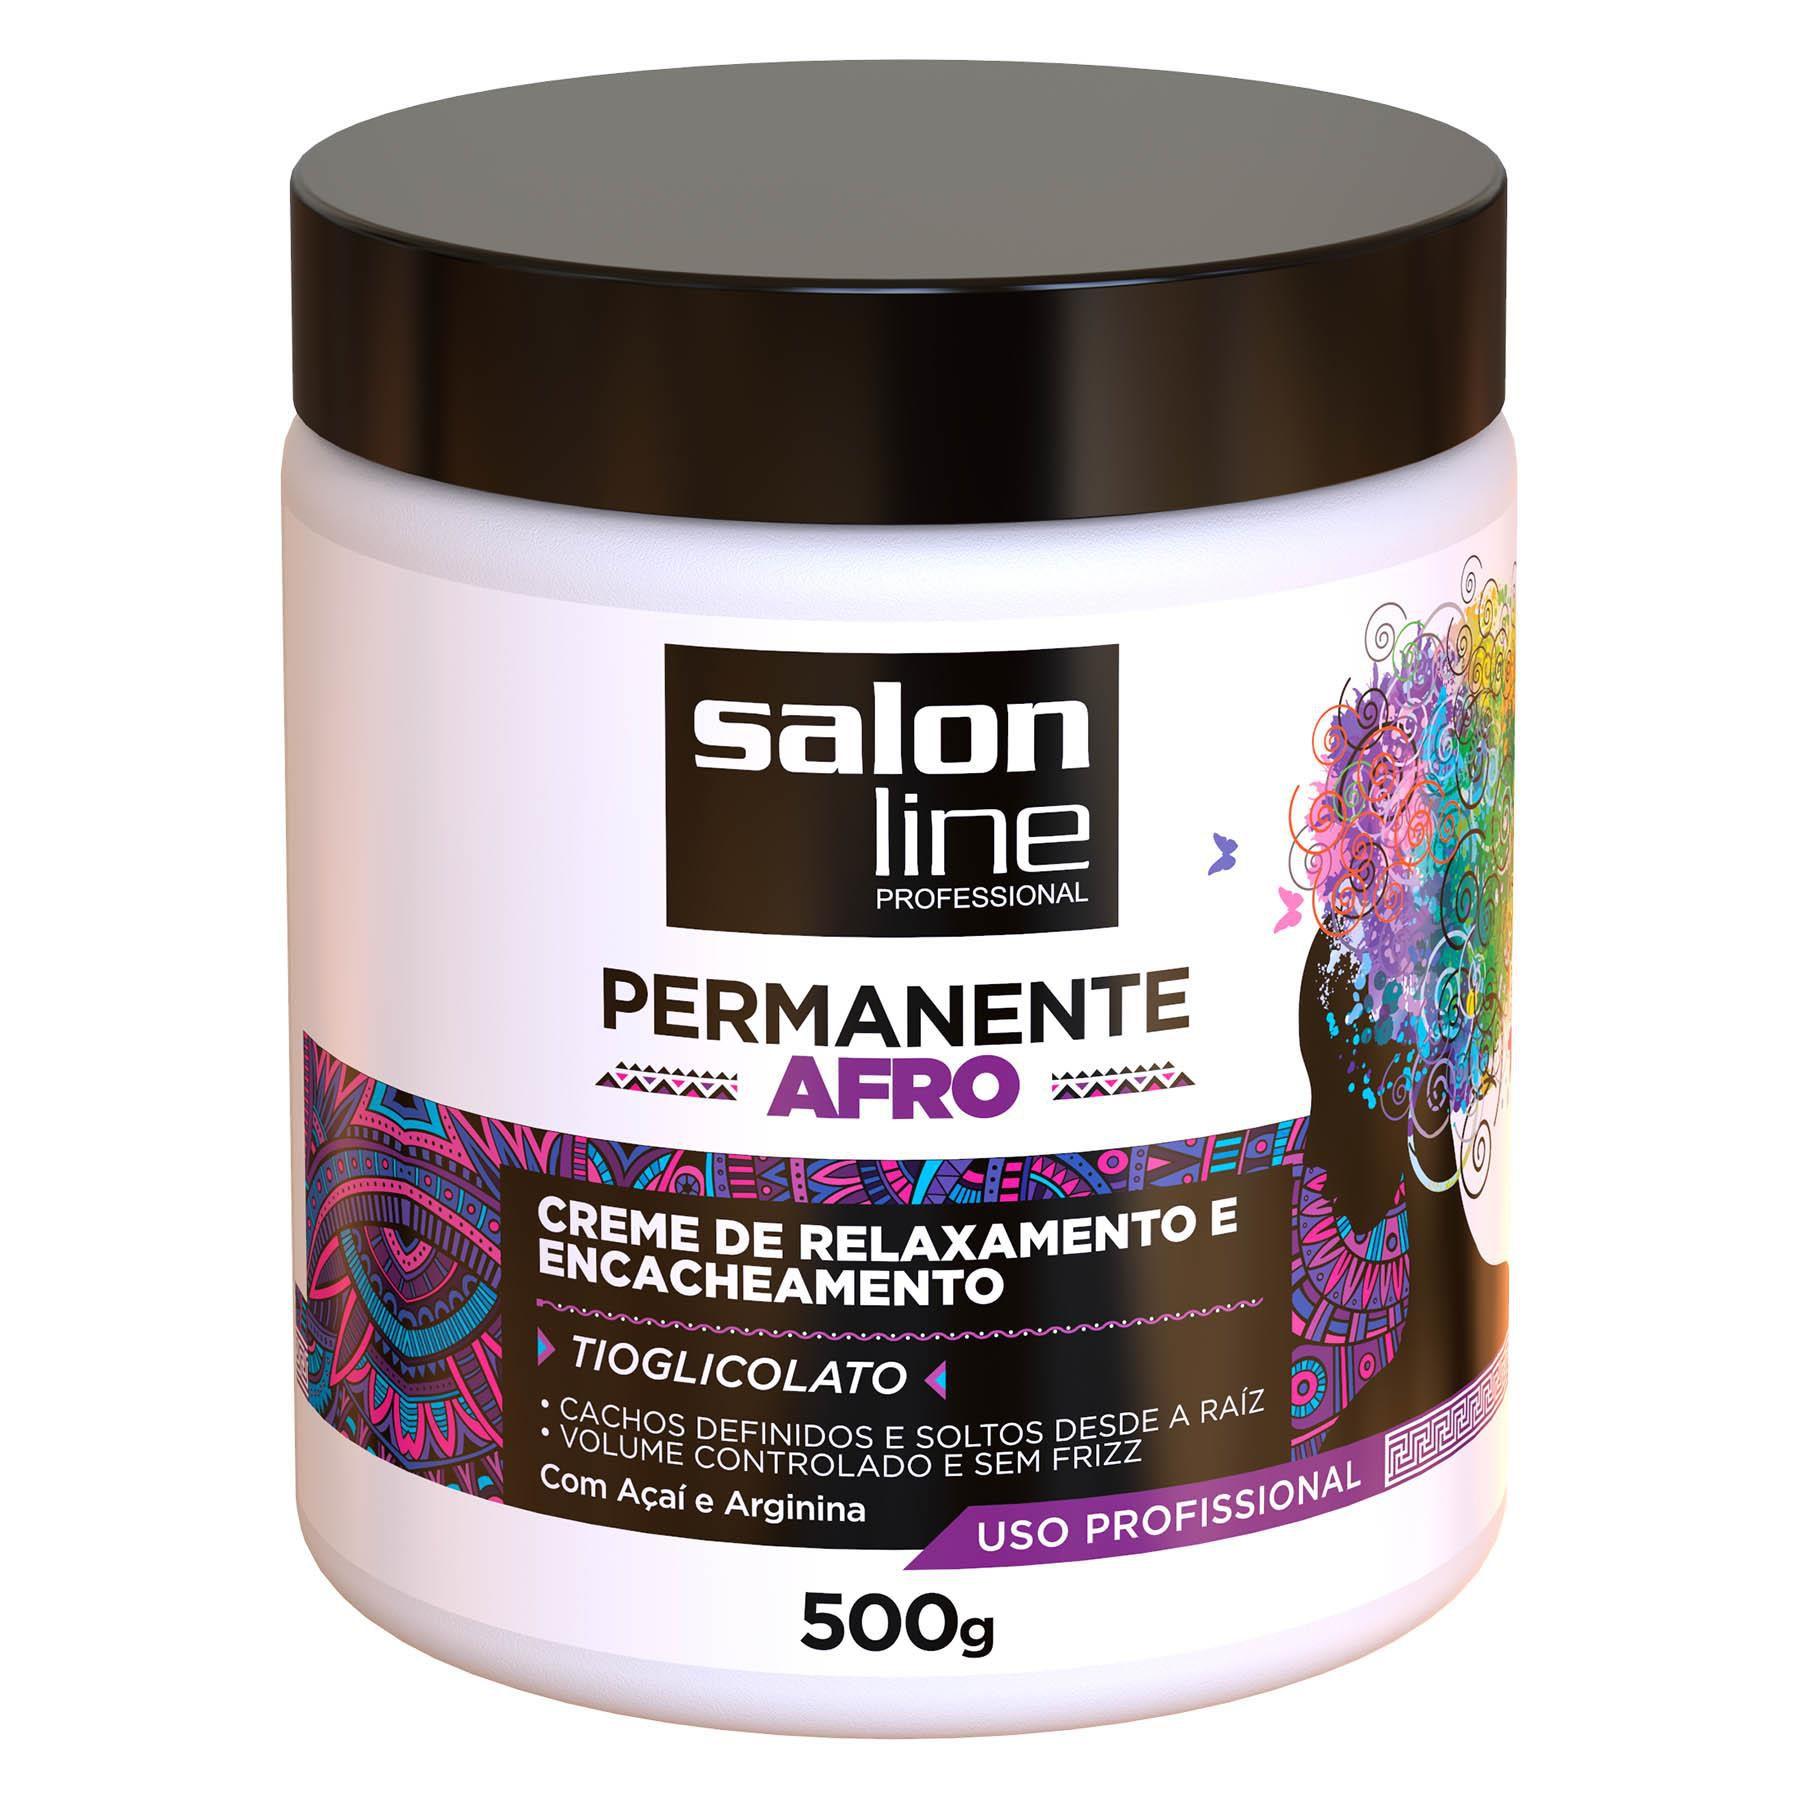 Salon Line Creme de Relaxamento e Encacheamento Permanente Afro Tioglicolato 500g